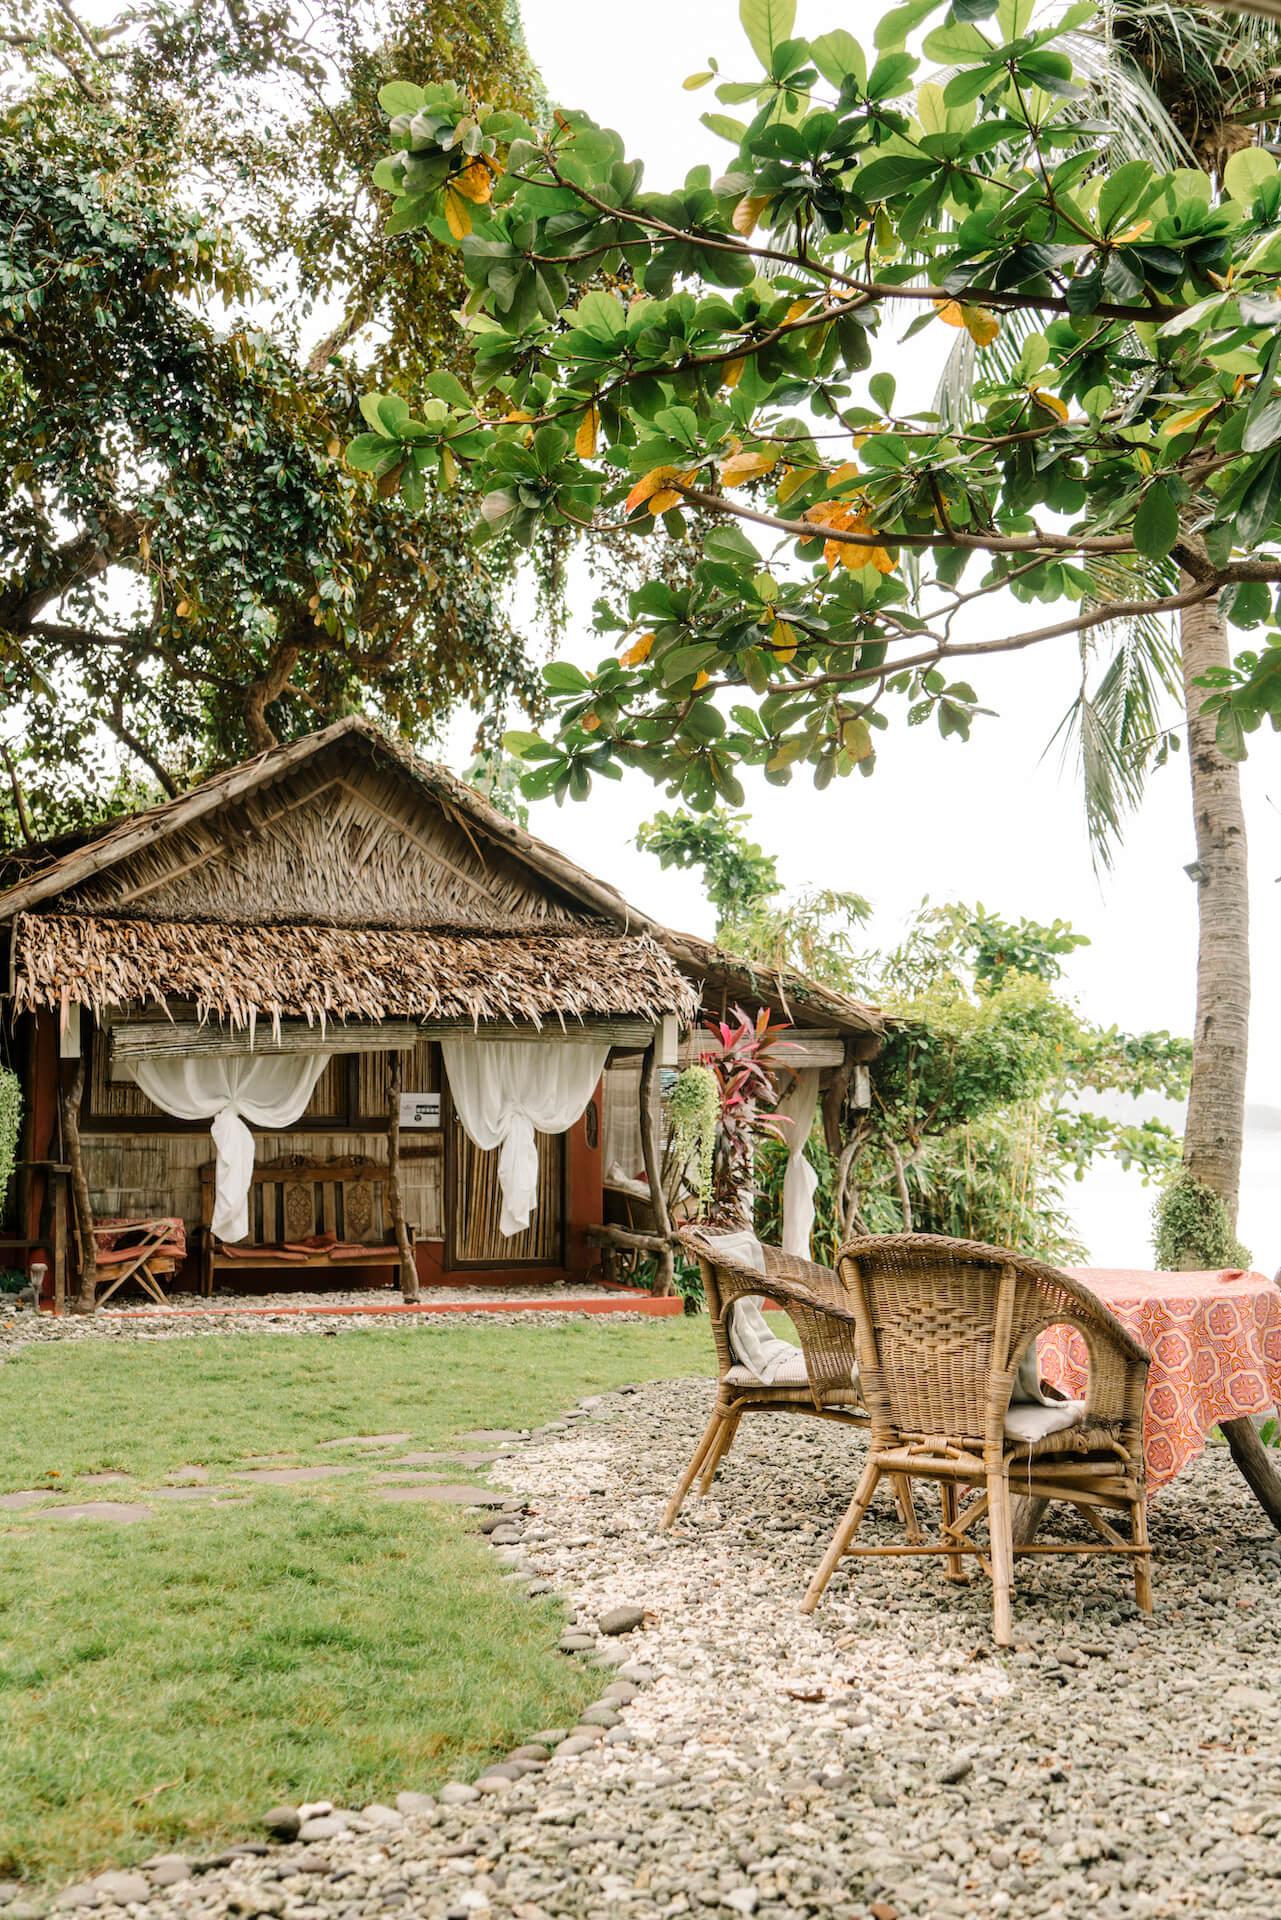 Exterior photo of Lilom Resort in Batangas